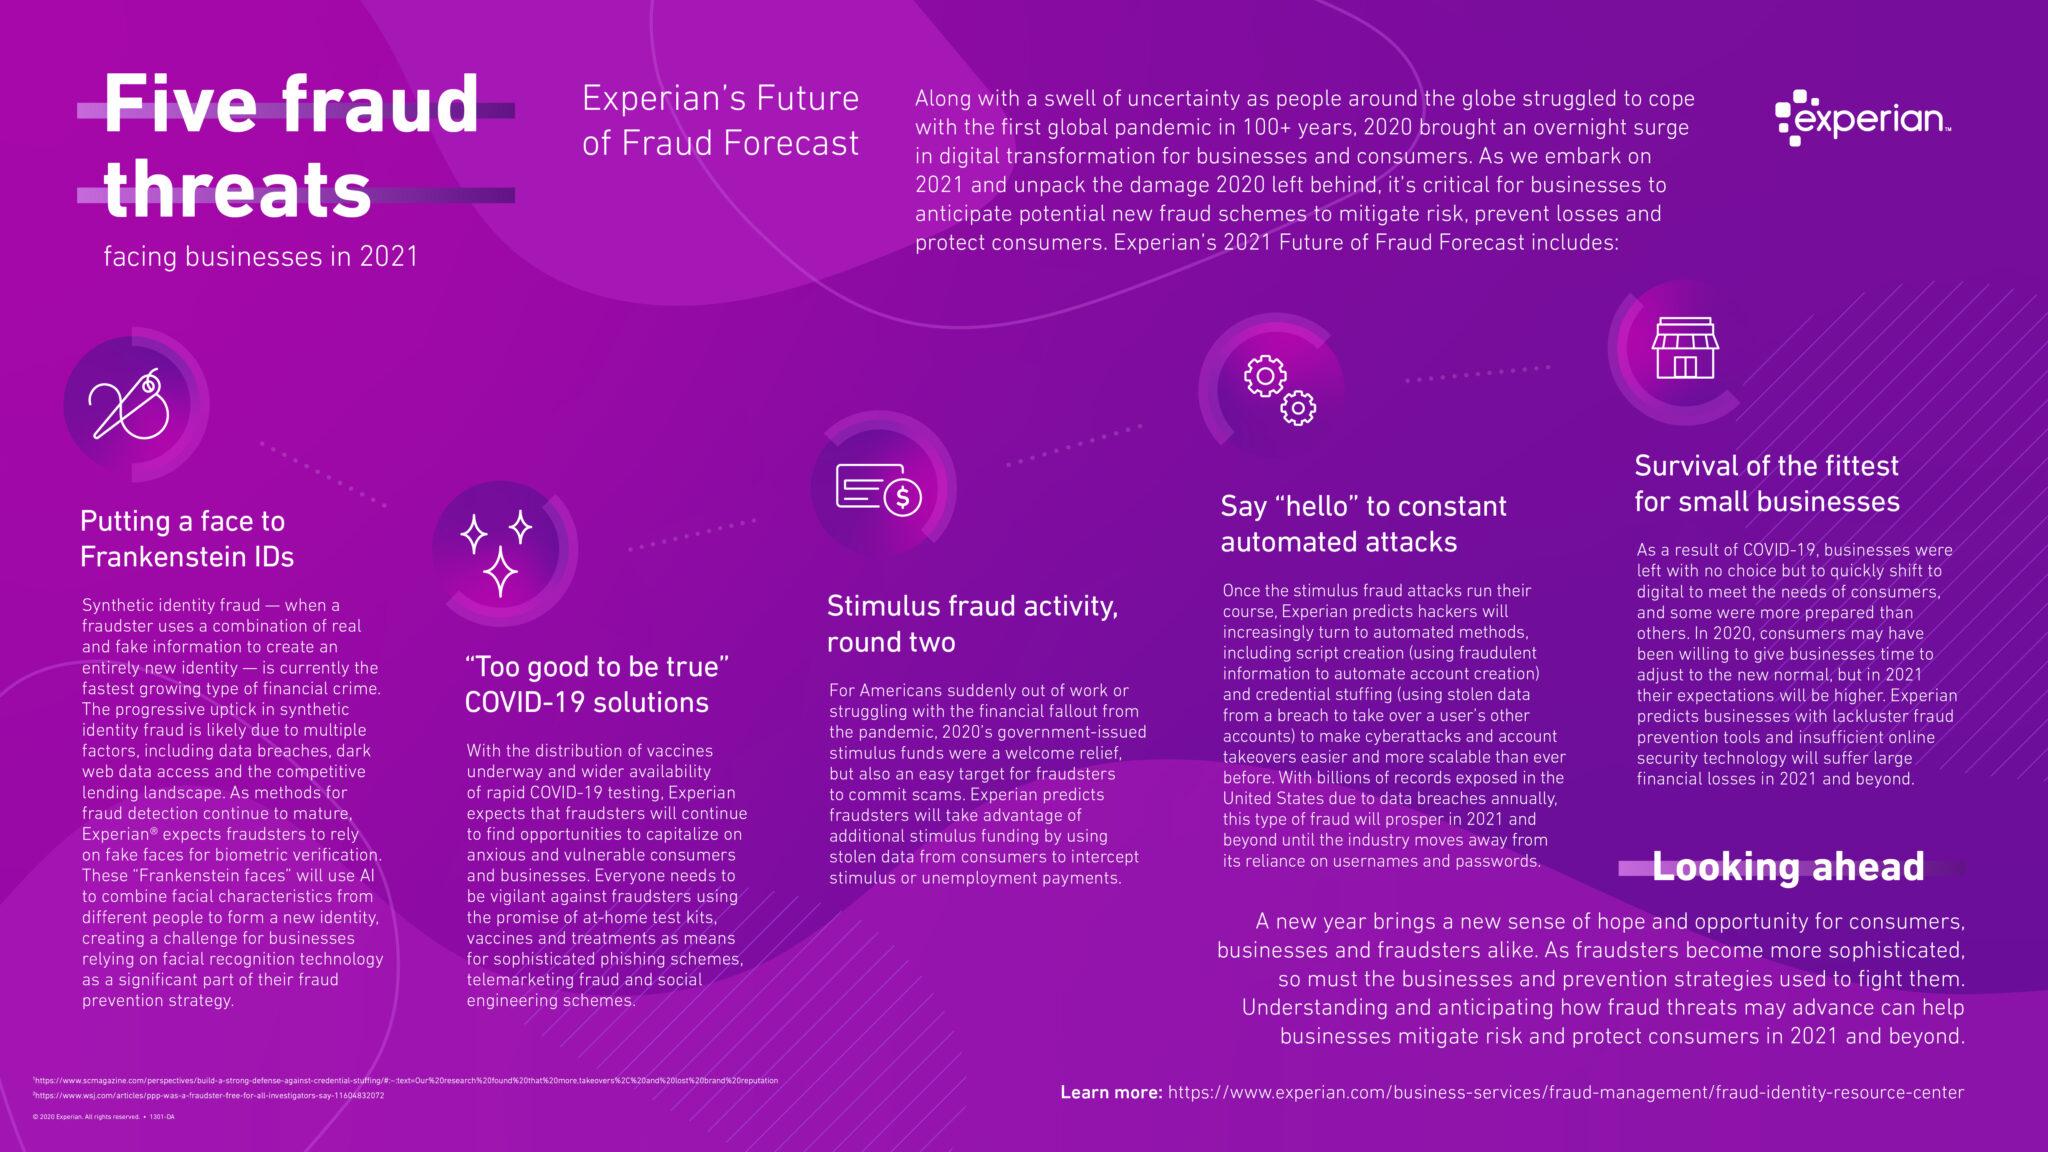 experian-future-fraud-forecast